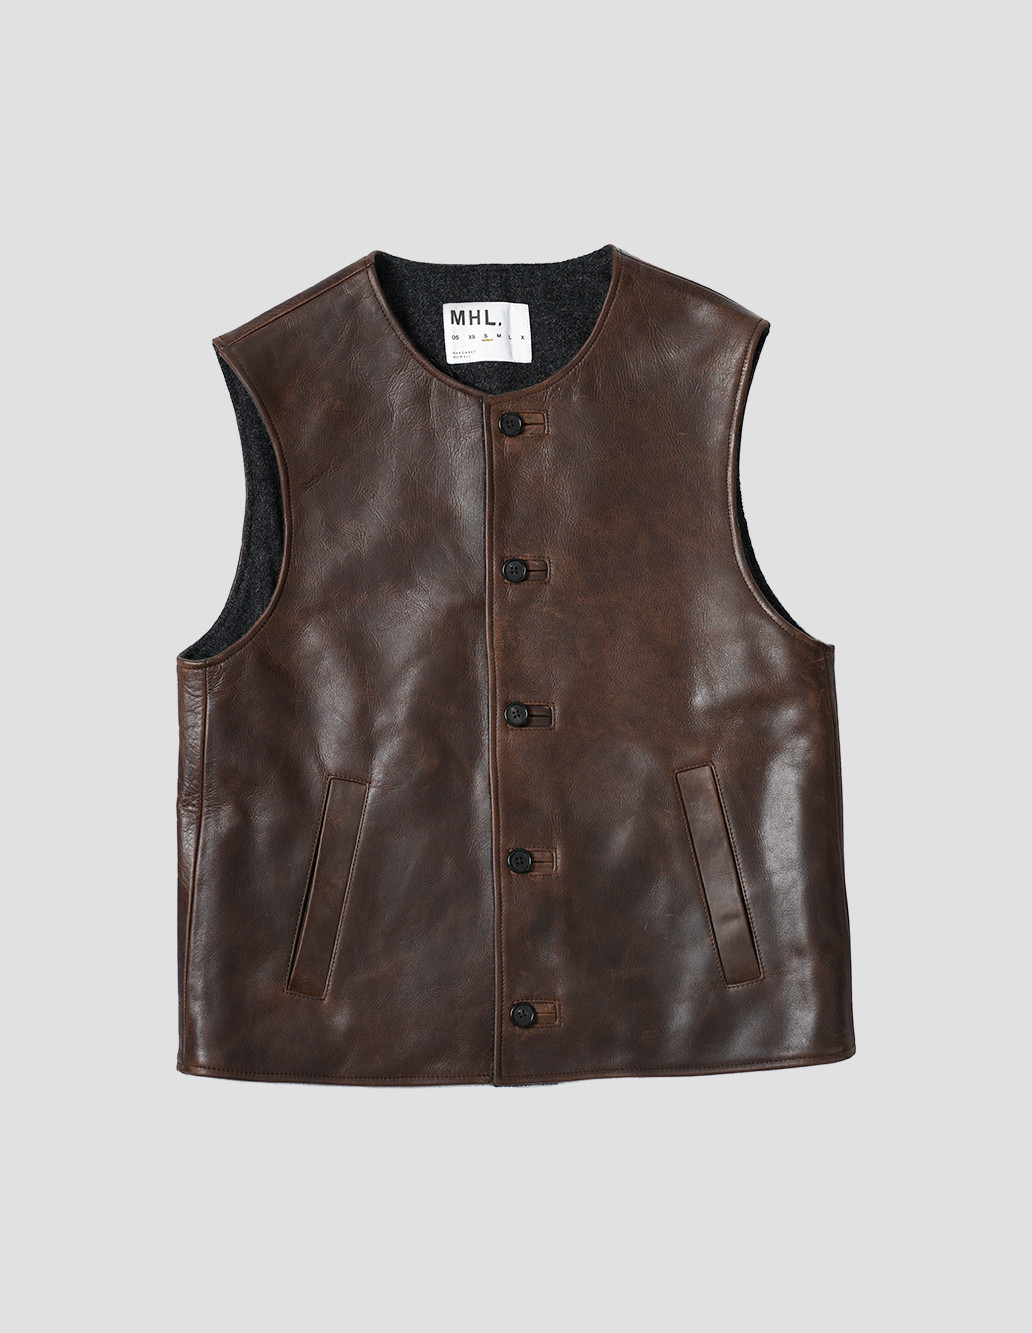 margaret-howell-women-aw17-coalmans-jerkin-cow-hide-diesel-brown